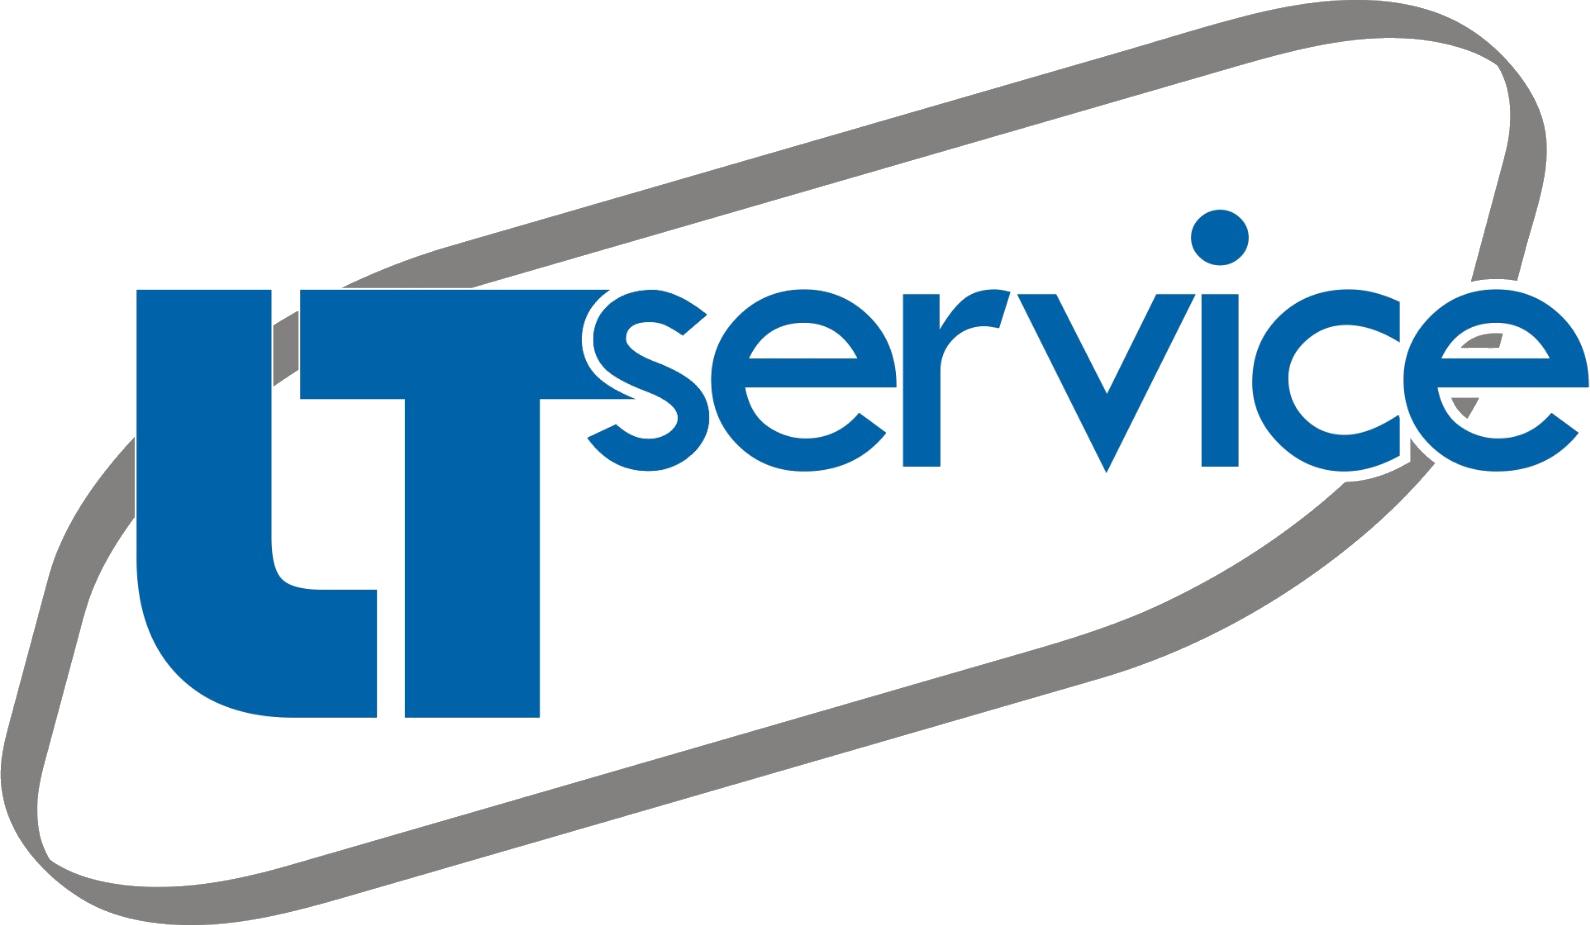 LT SERVICE